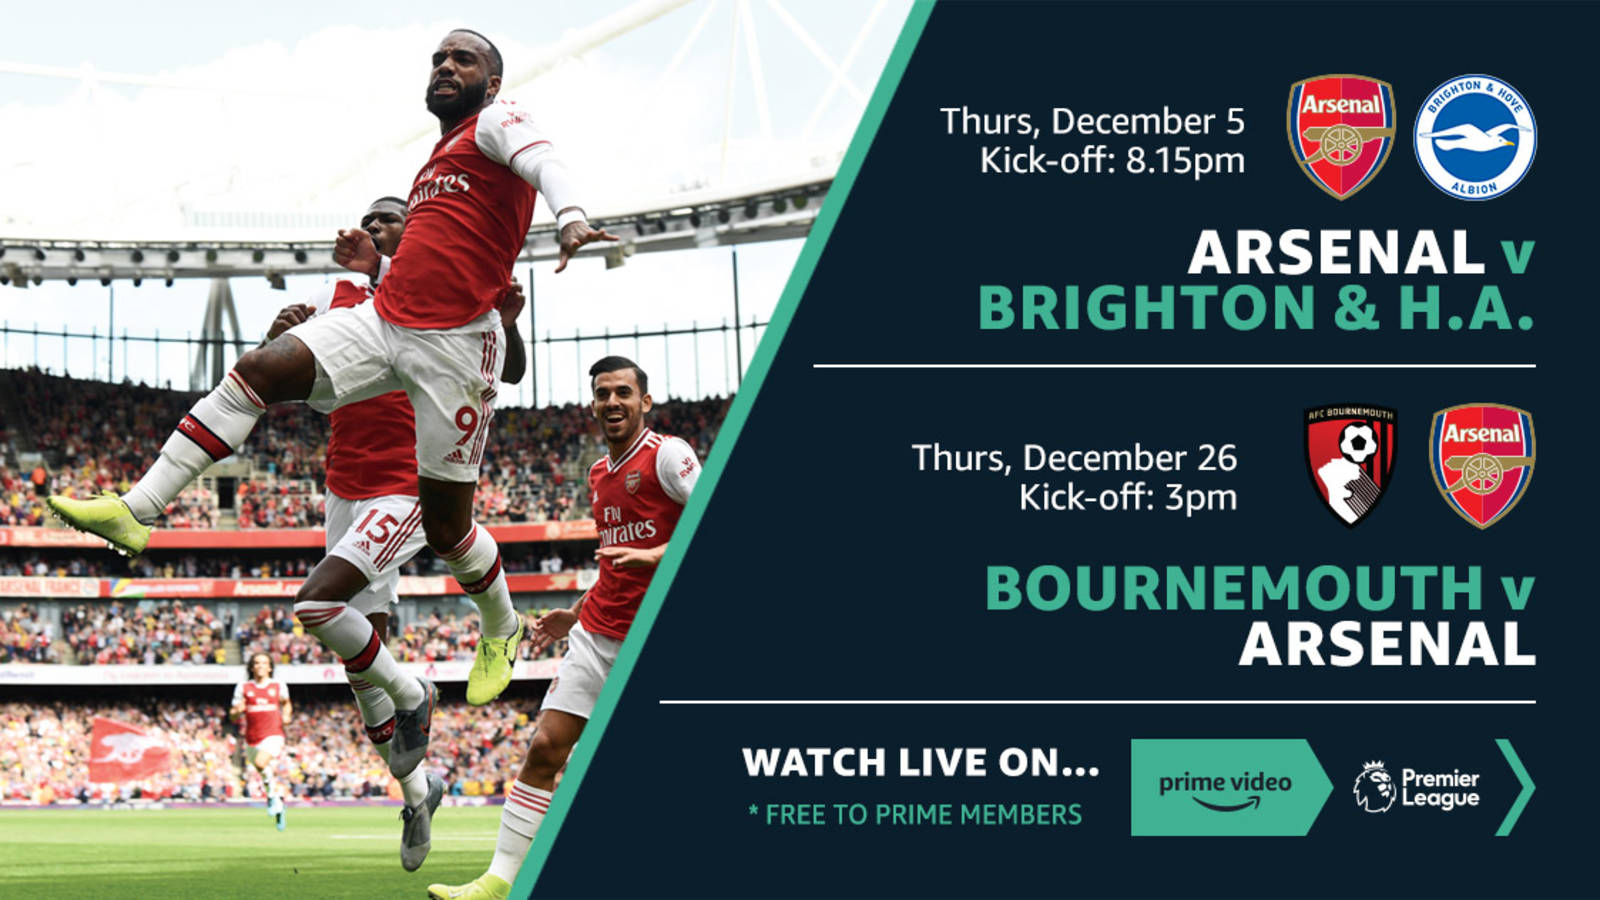 Arsenal games live on Amazon Prime Video Partner promotion 1600x900